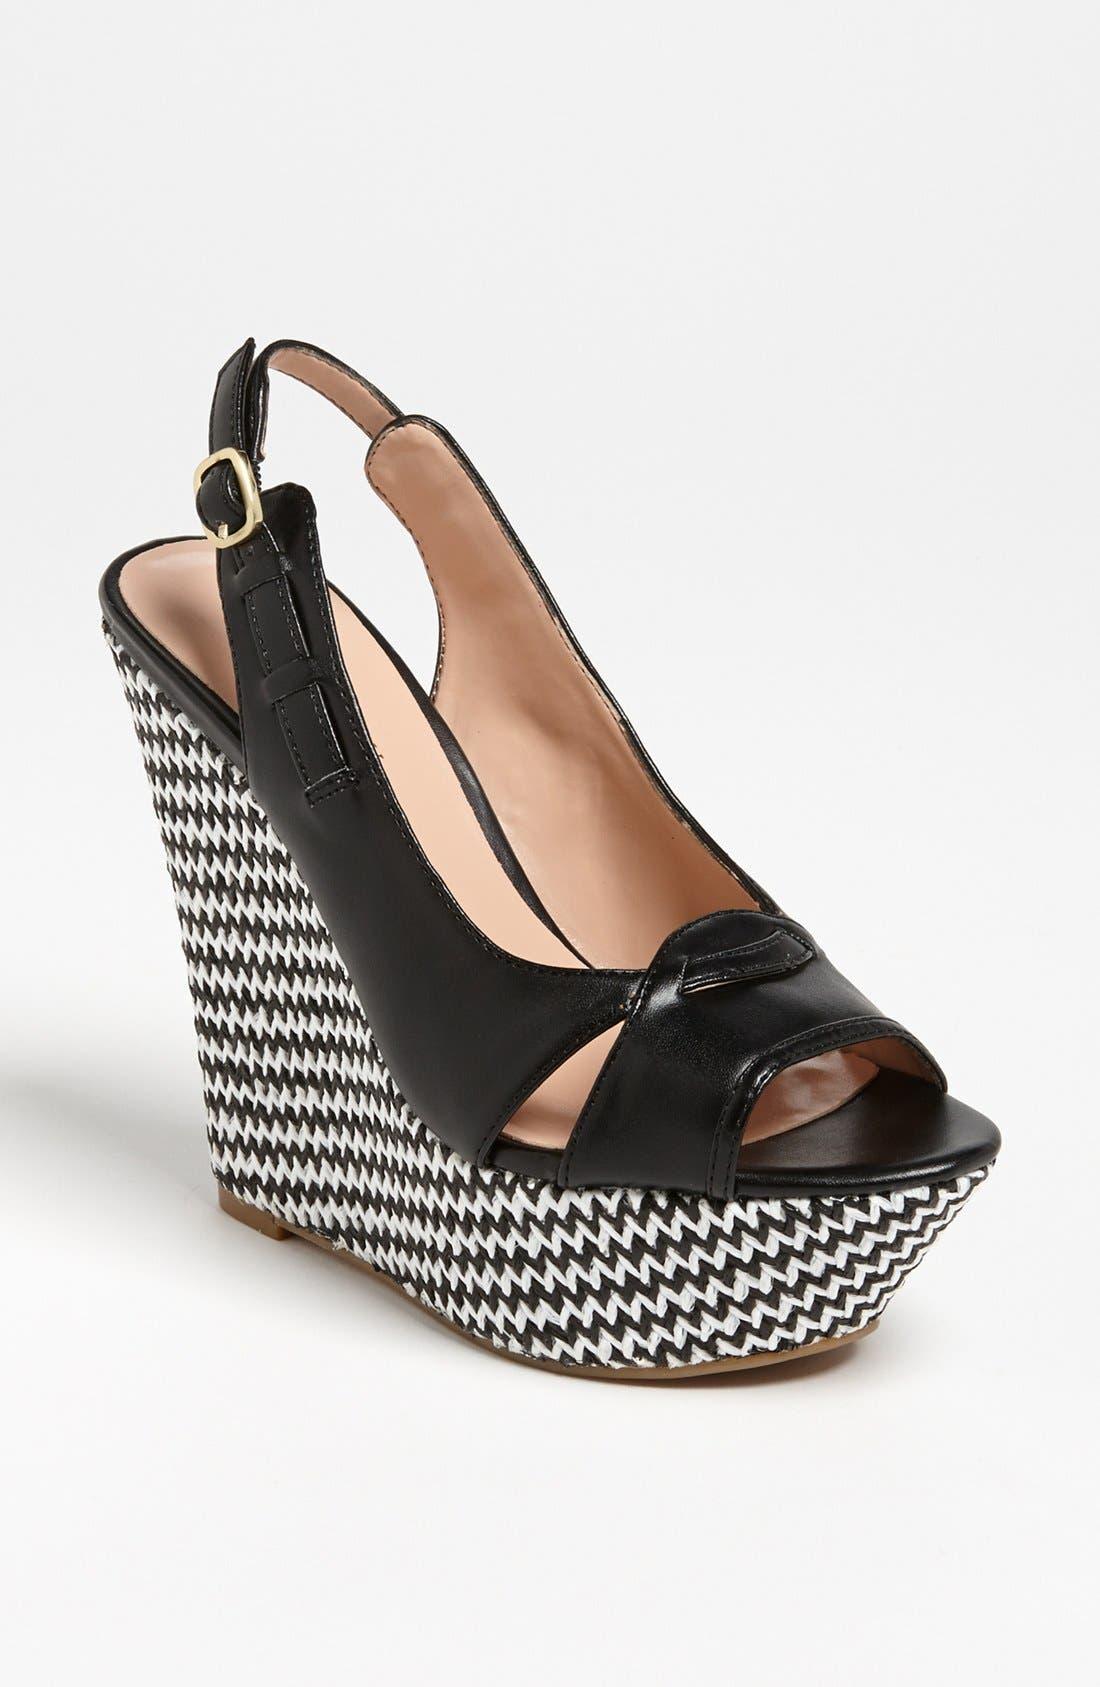 Alternate Image 1 Selected - Sole Society 'Braelyn' Sandal